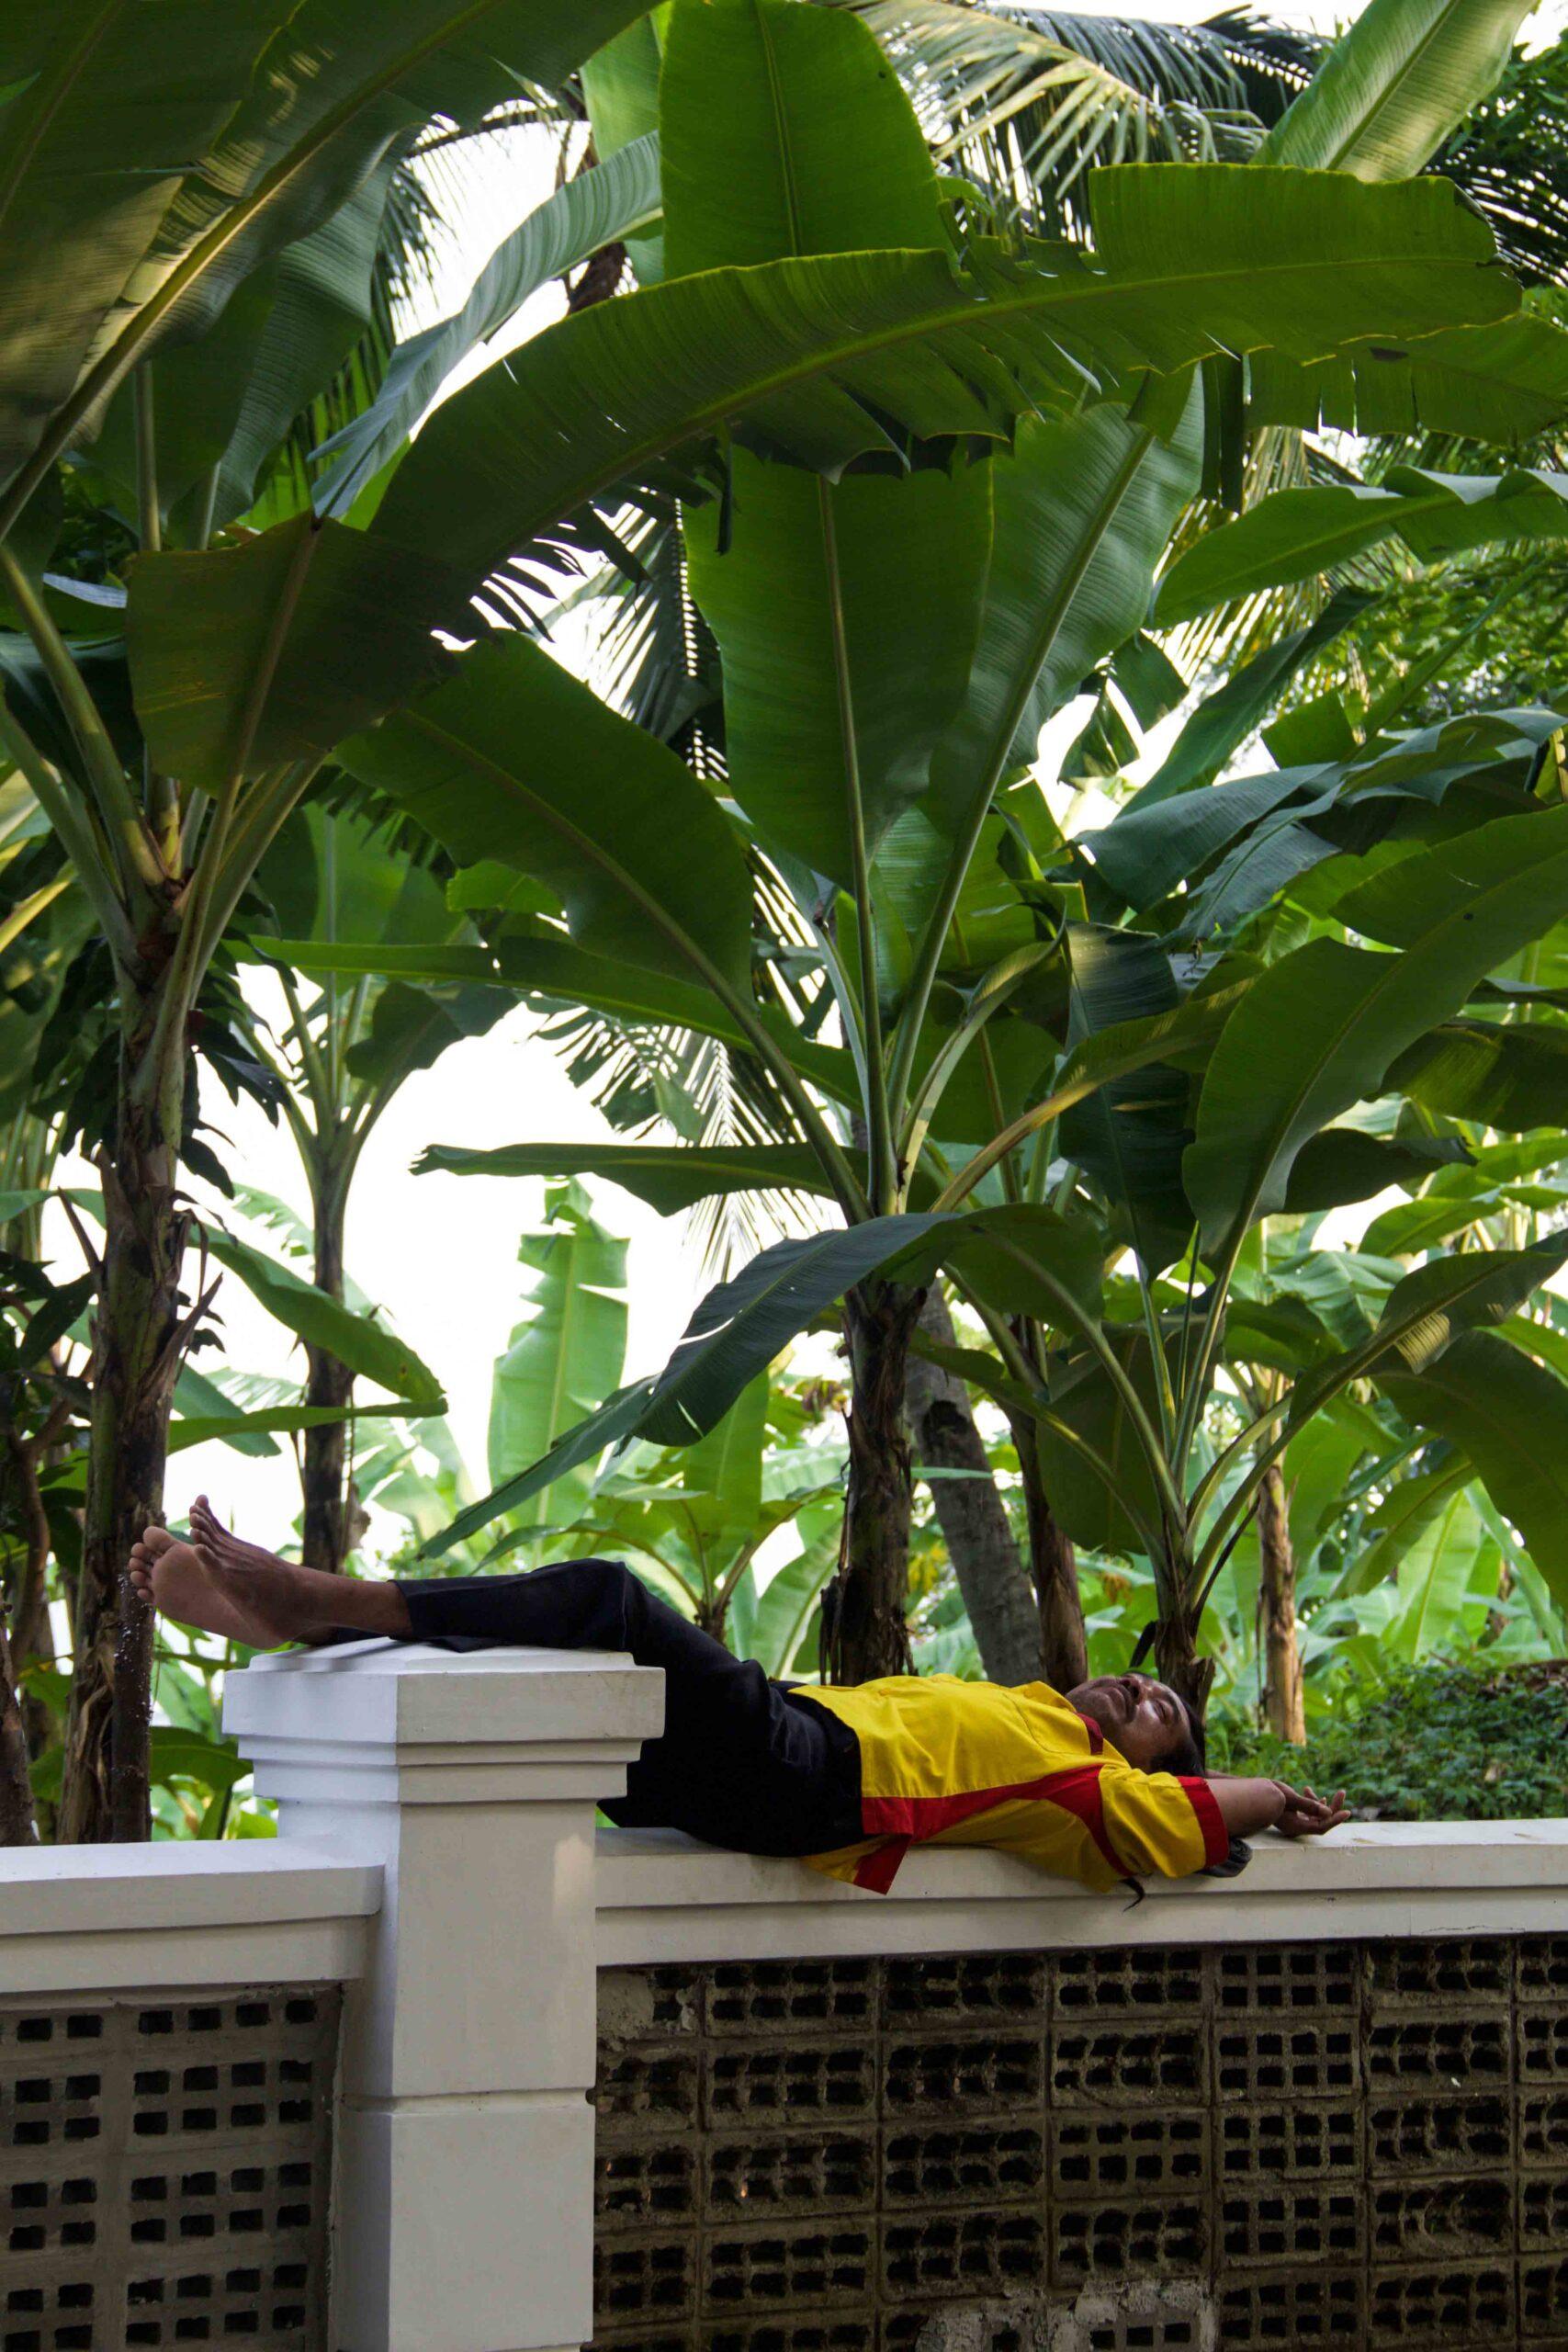 Local man sleeping in Cimaja Java